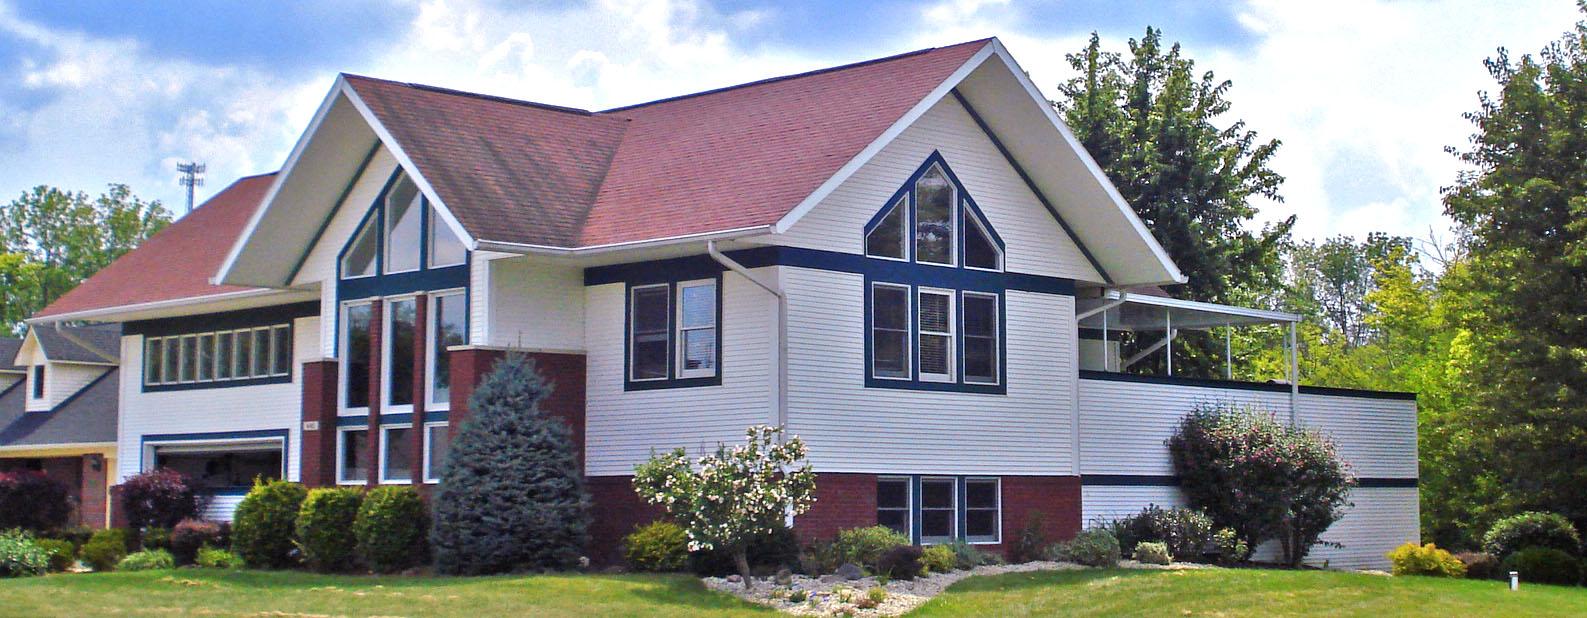 House Blueprints For Houses 3 Bedroom Home Floor Plans 2